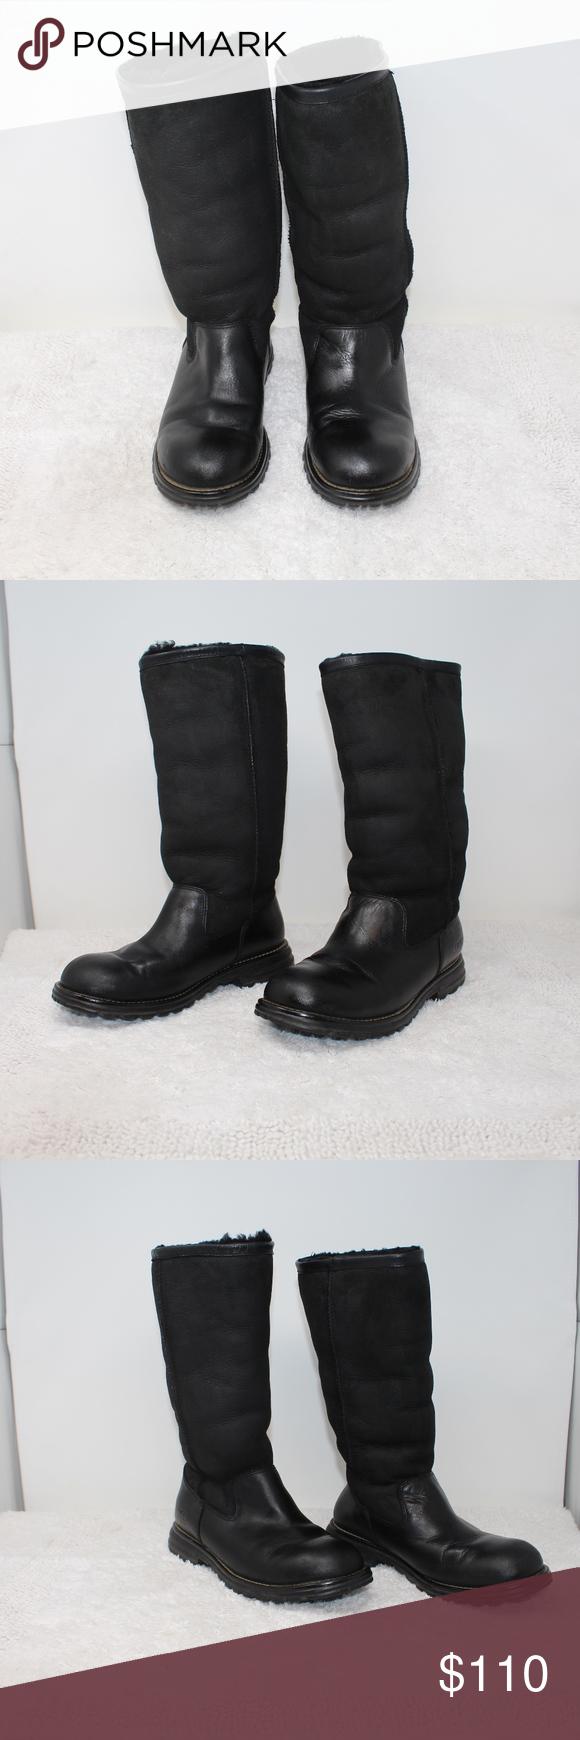 91b42e7b8b0 UGG Brooks Brook BLACK Suede Leather High Boots 7 Size 7, EU 38 ...